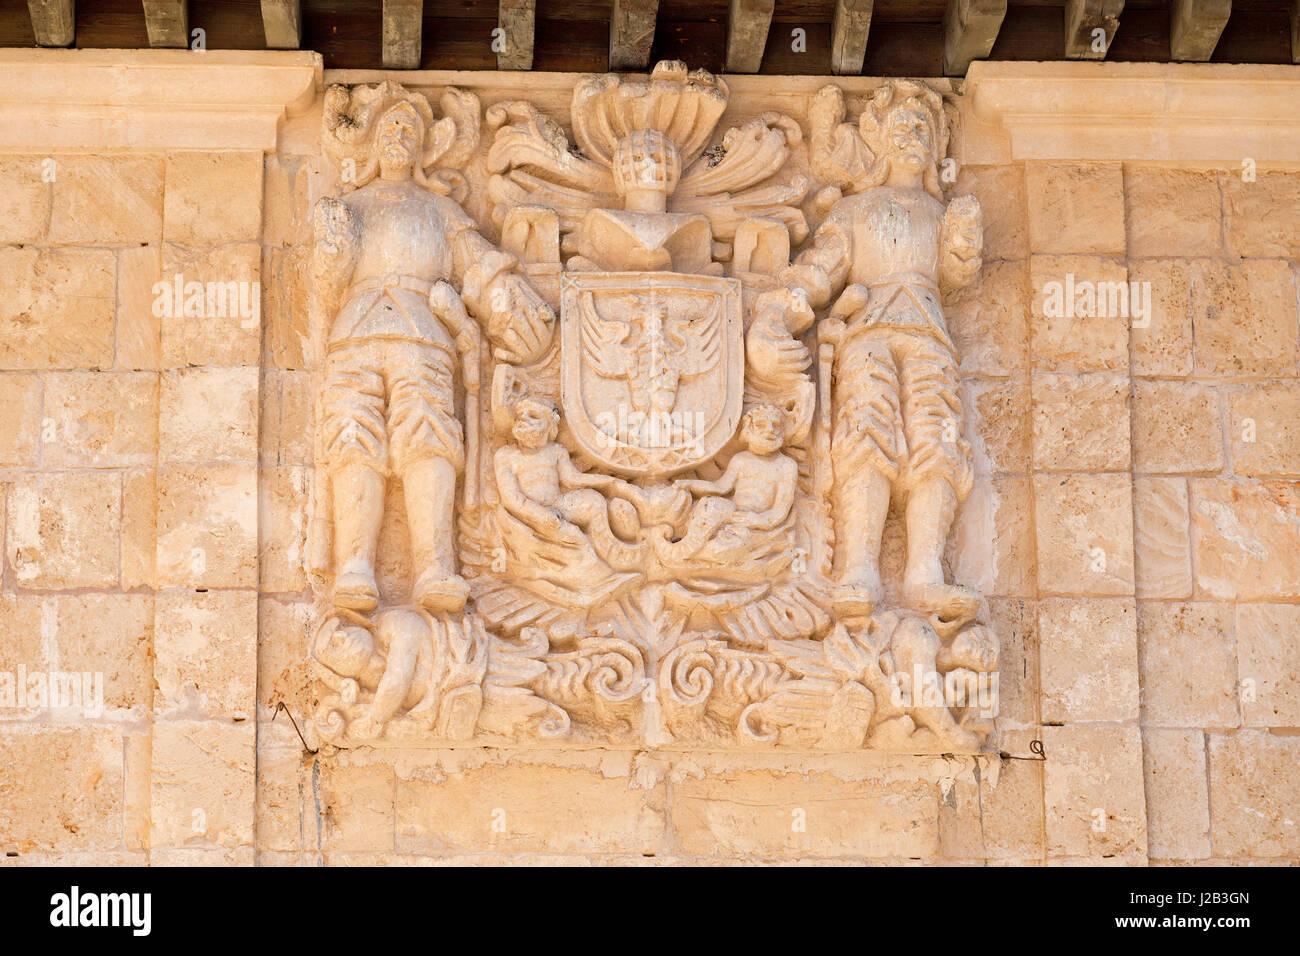 relief at Poble Espanyol in Palma de Mallorca, Spain - Stock Image